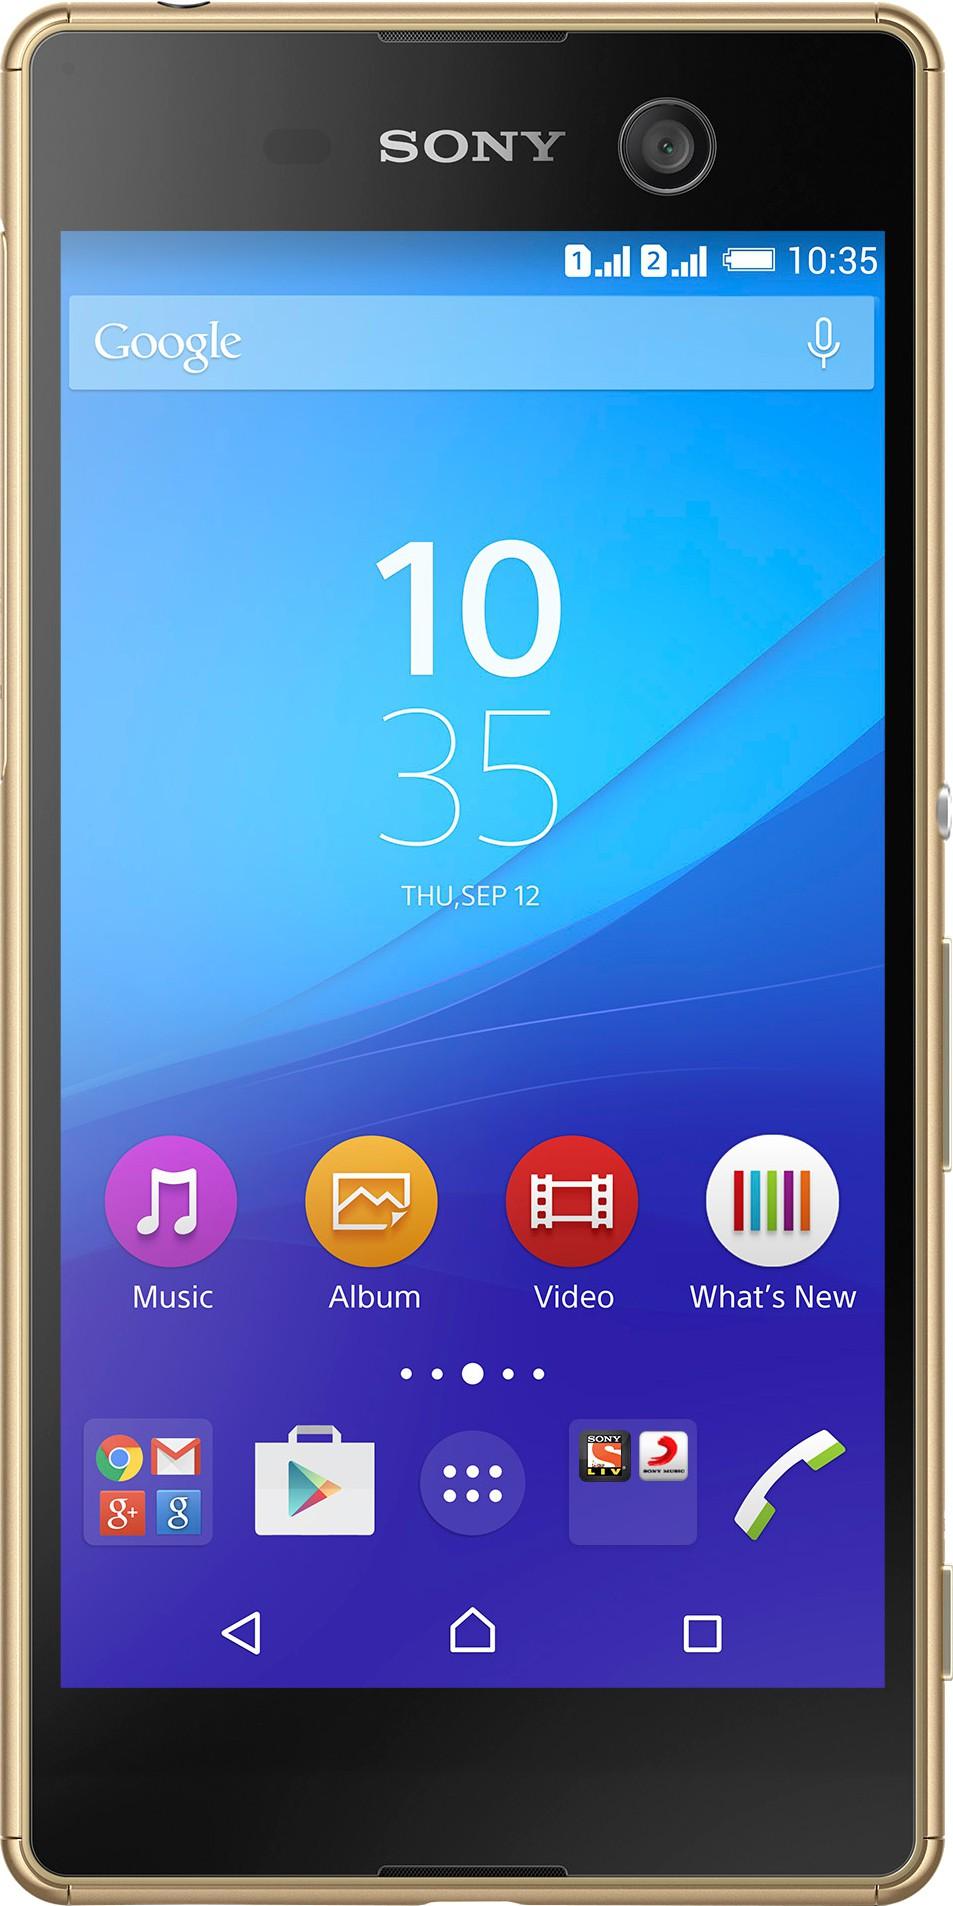 Sony Xperia M5 (3GB RAM, 16GB)